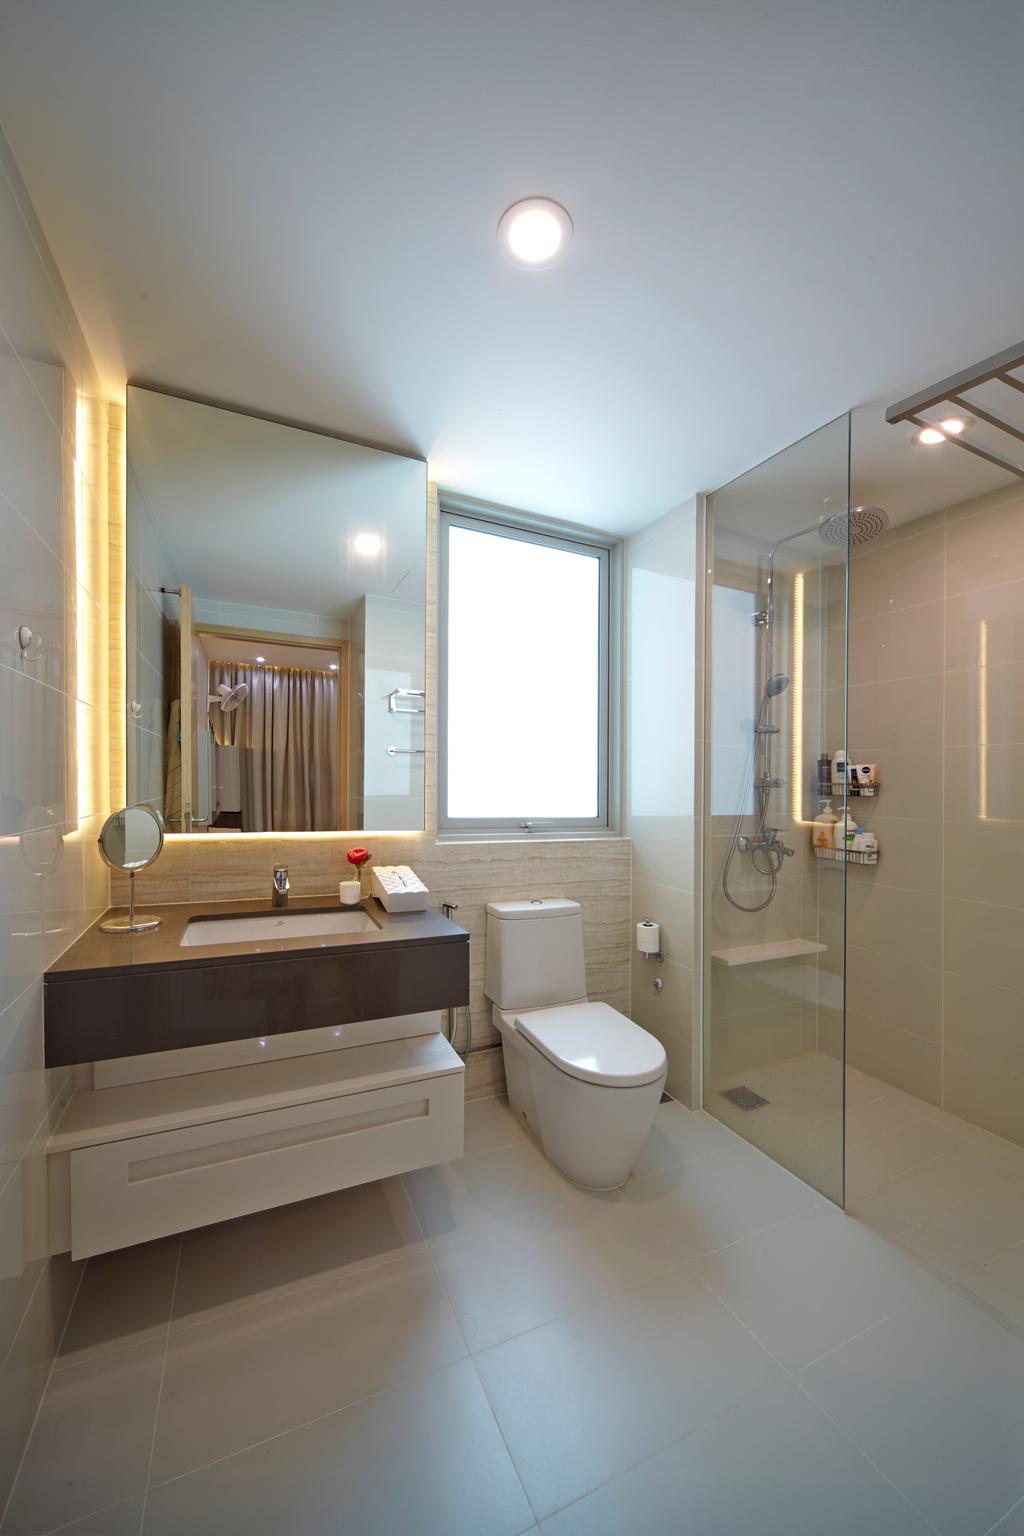 Transitional, Condo, Bathroom, Tree House, Interior Designer, Carpenters 匠, Bathroom Vanity, Bathroom Cabinet, Mirror, Water Closet, Toilet Bowl, Shower Area, Shower Screen, Clean, Clean Bathroom, Indoors, Interior Design, Room